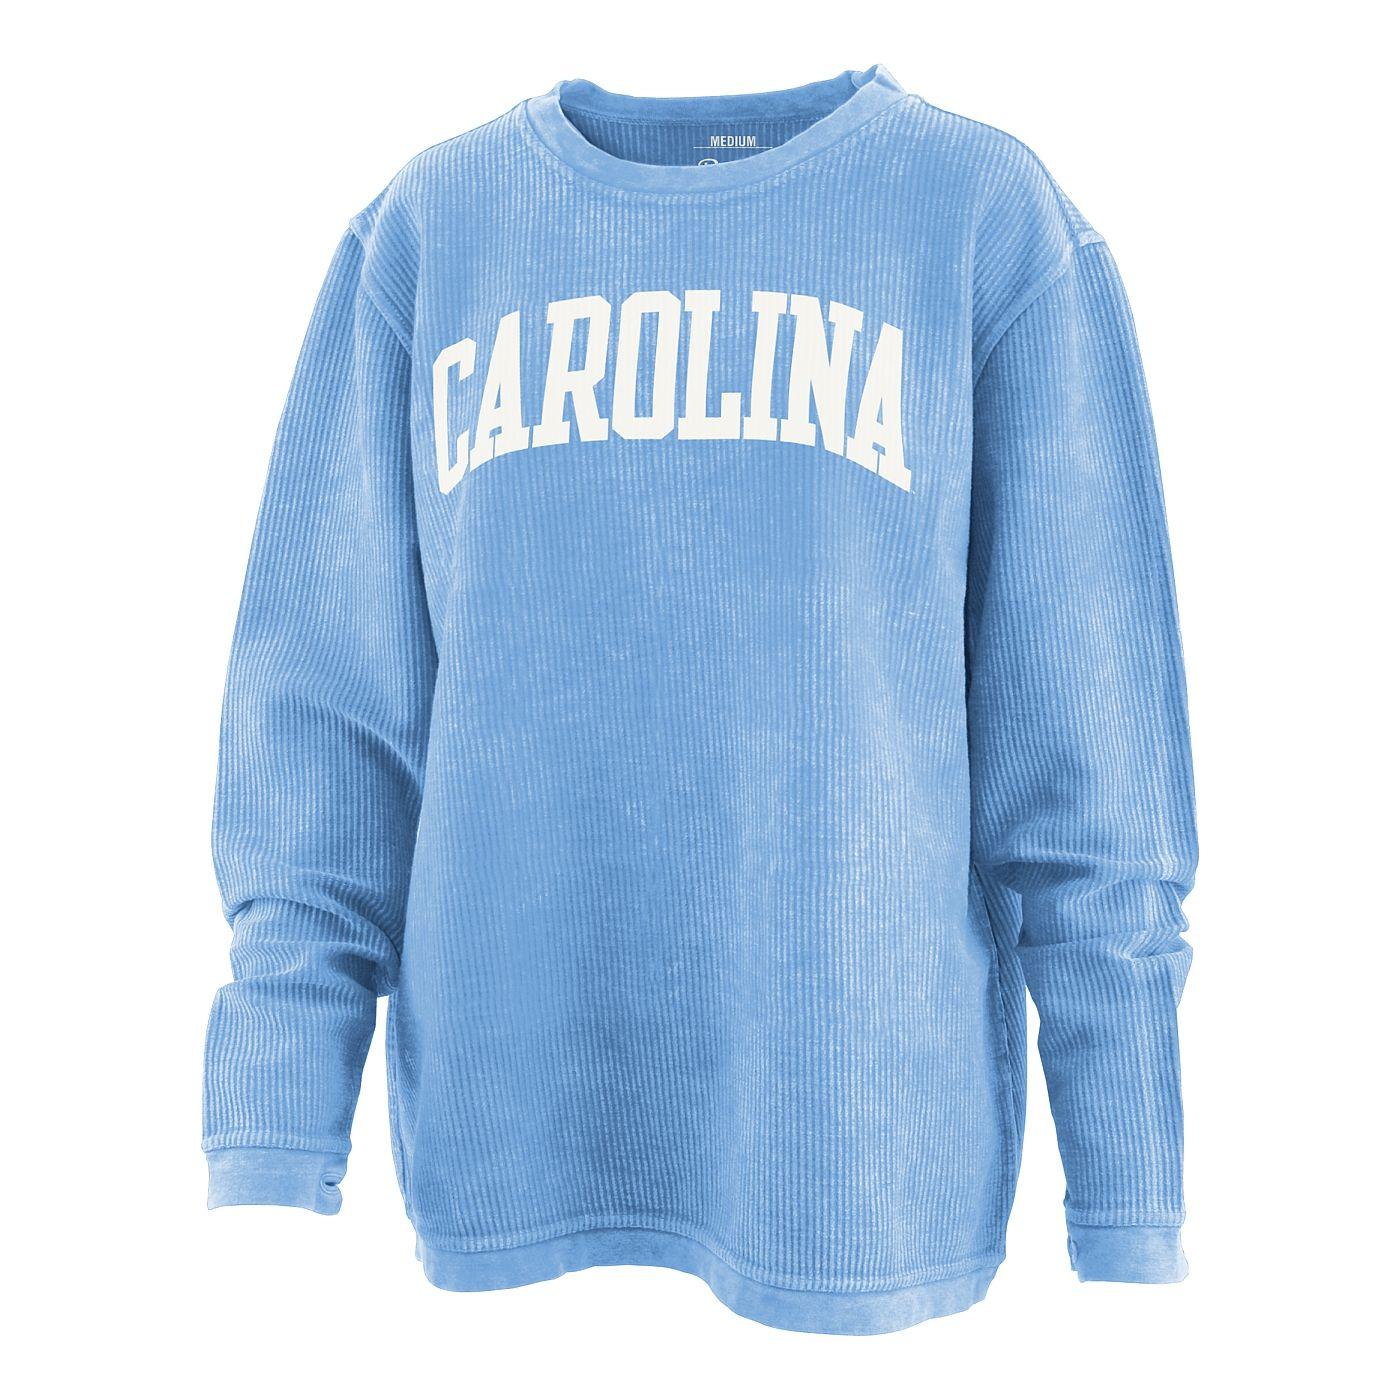 Comfy Cord Crew Washed Cb By Pressbox North Carolina Shirt Johnny T Shirt Sweatshirts Hoodie [ 1400 x 1400 Pixel ]